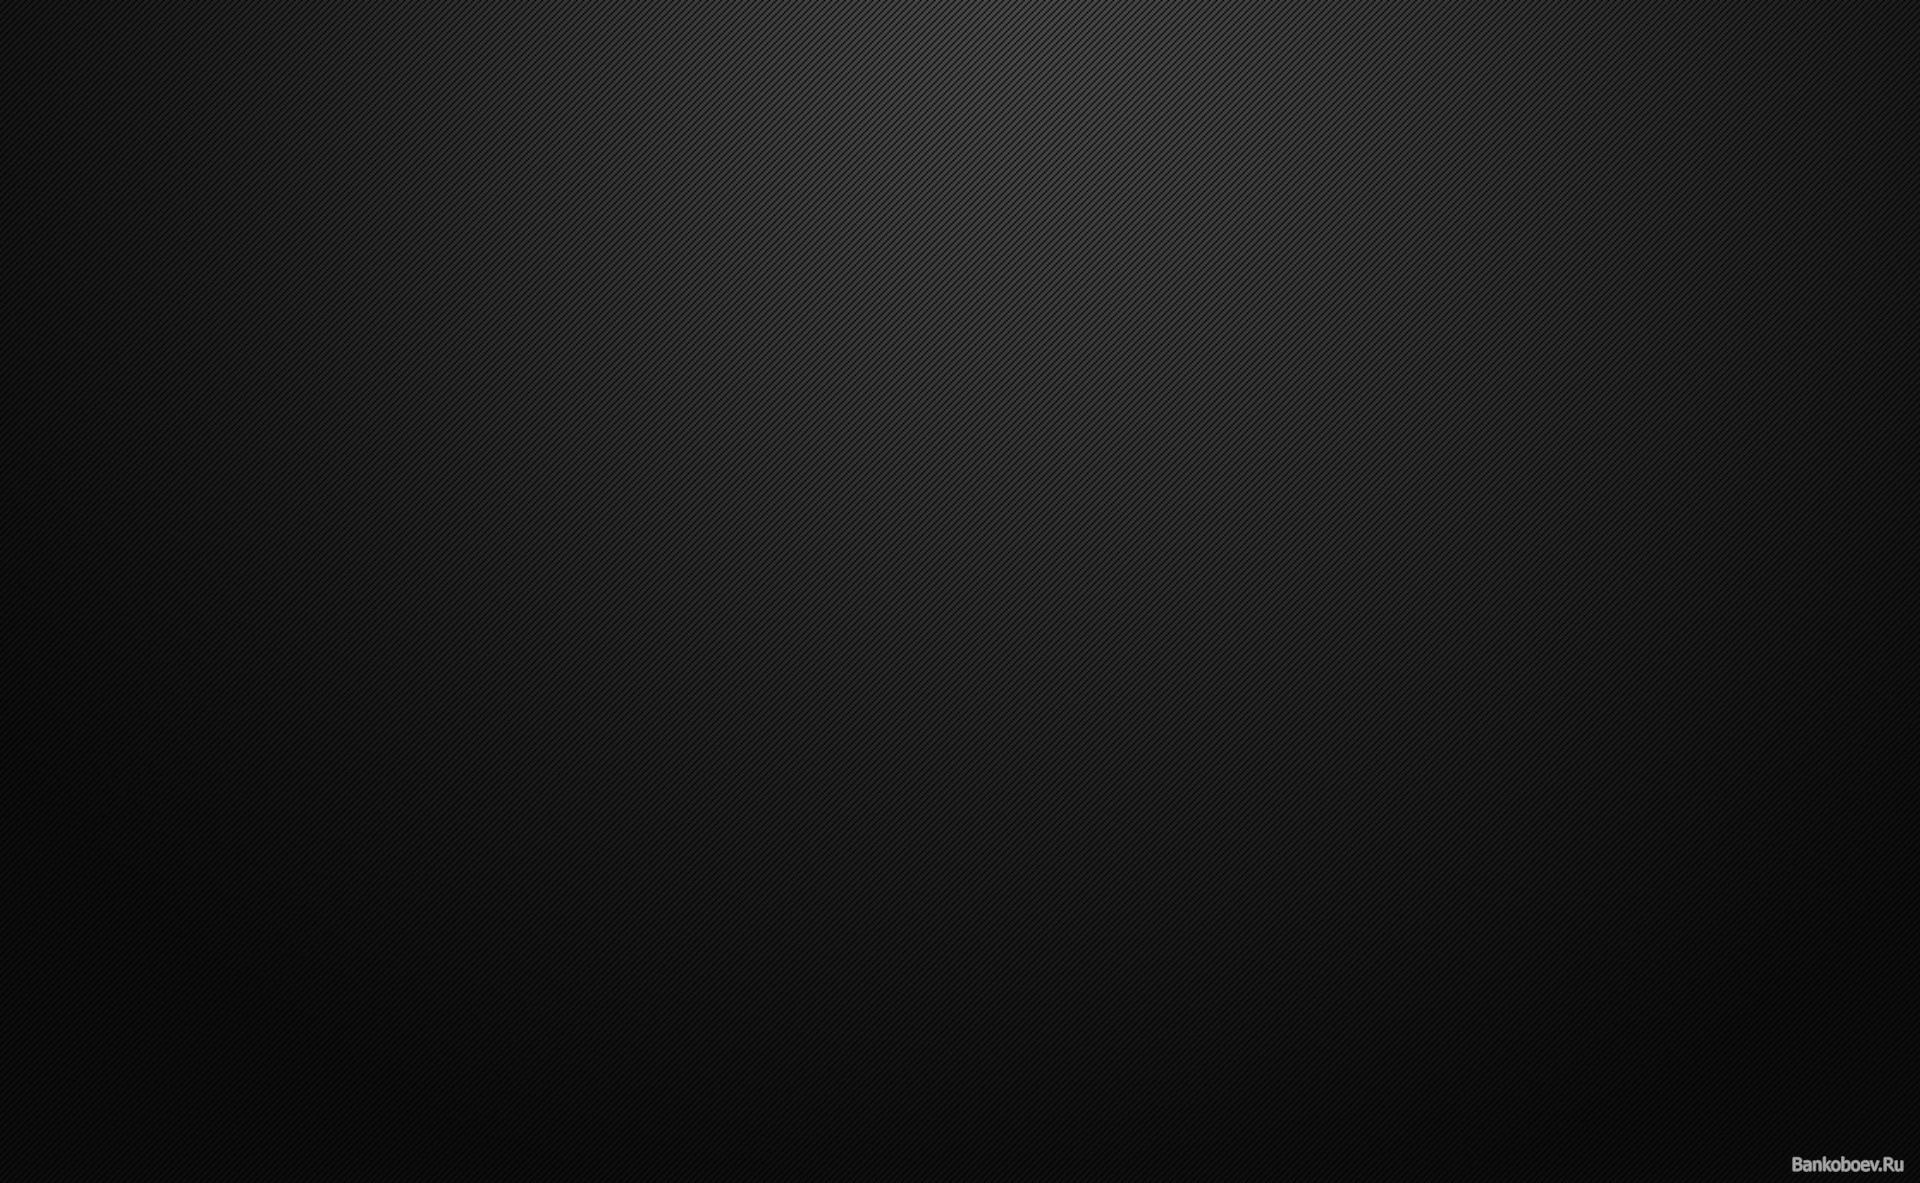 gris hq fondo negro - photo #2